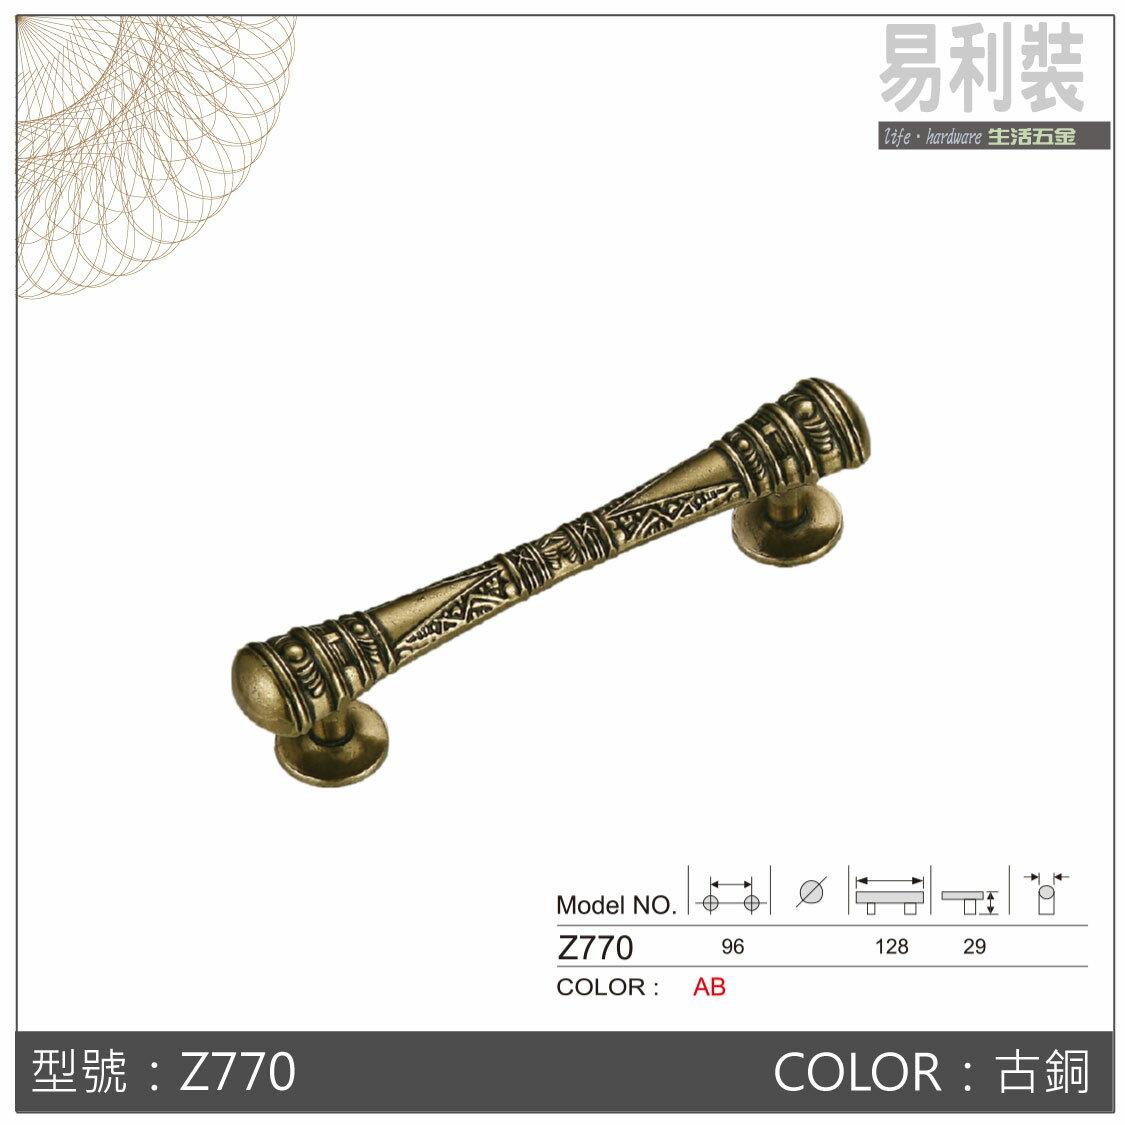 Z770-96-古銅色 易利裝生活五金 櫥櫃抽屜把手取手 古典把手 復古把手 鋅合金把手